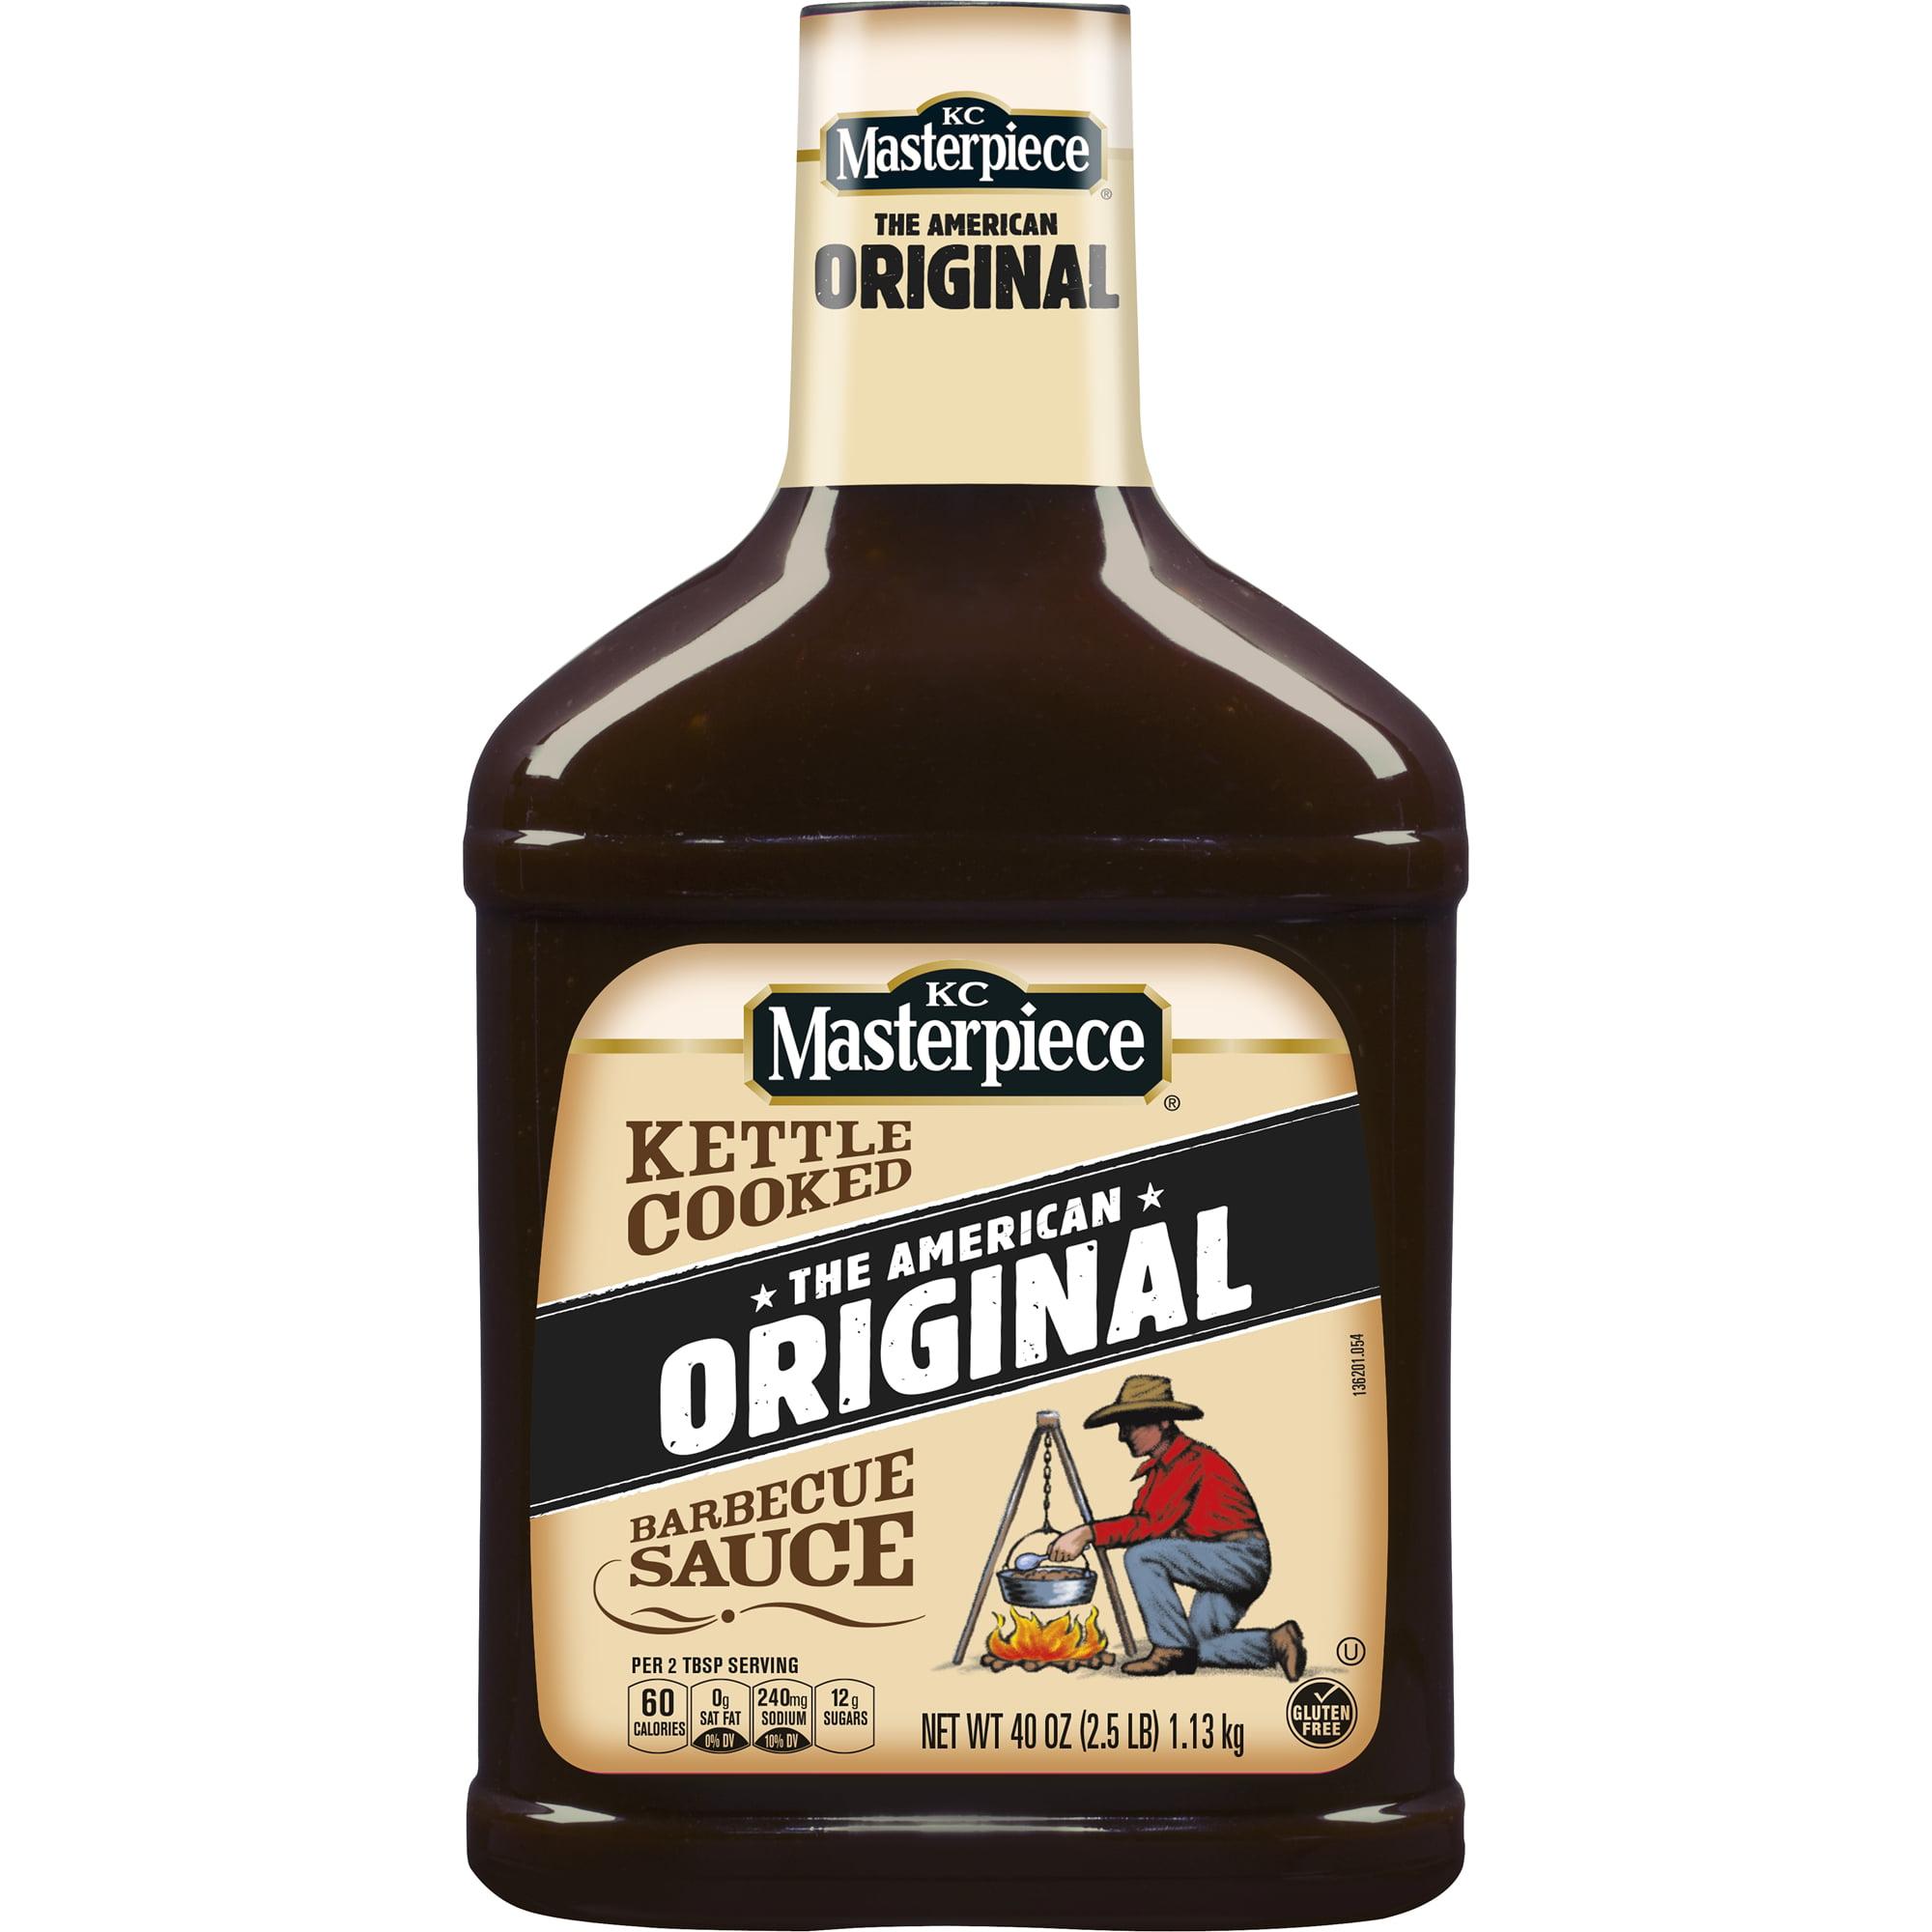 KC Masterpiece Original Barbecue Sauce, 40 oz